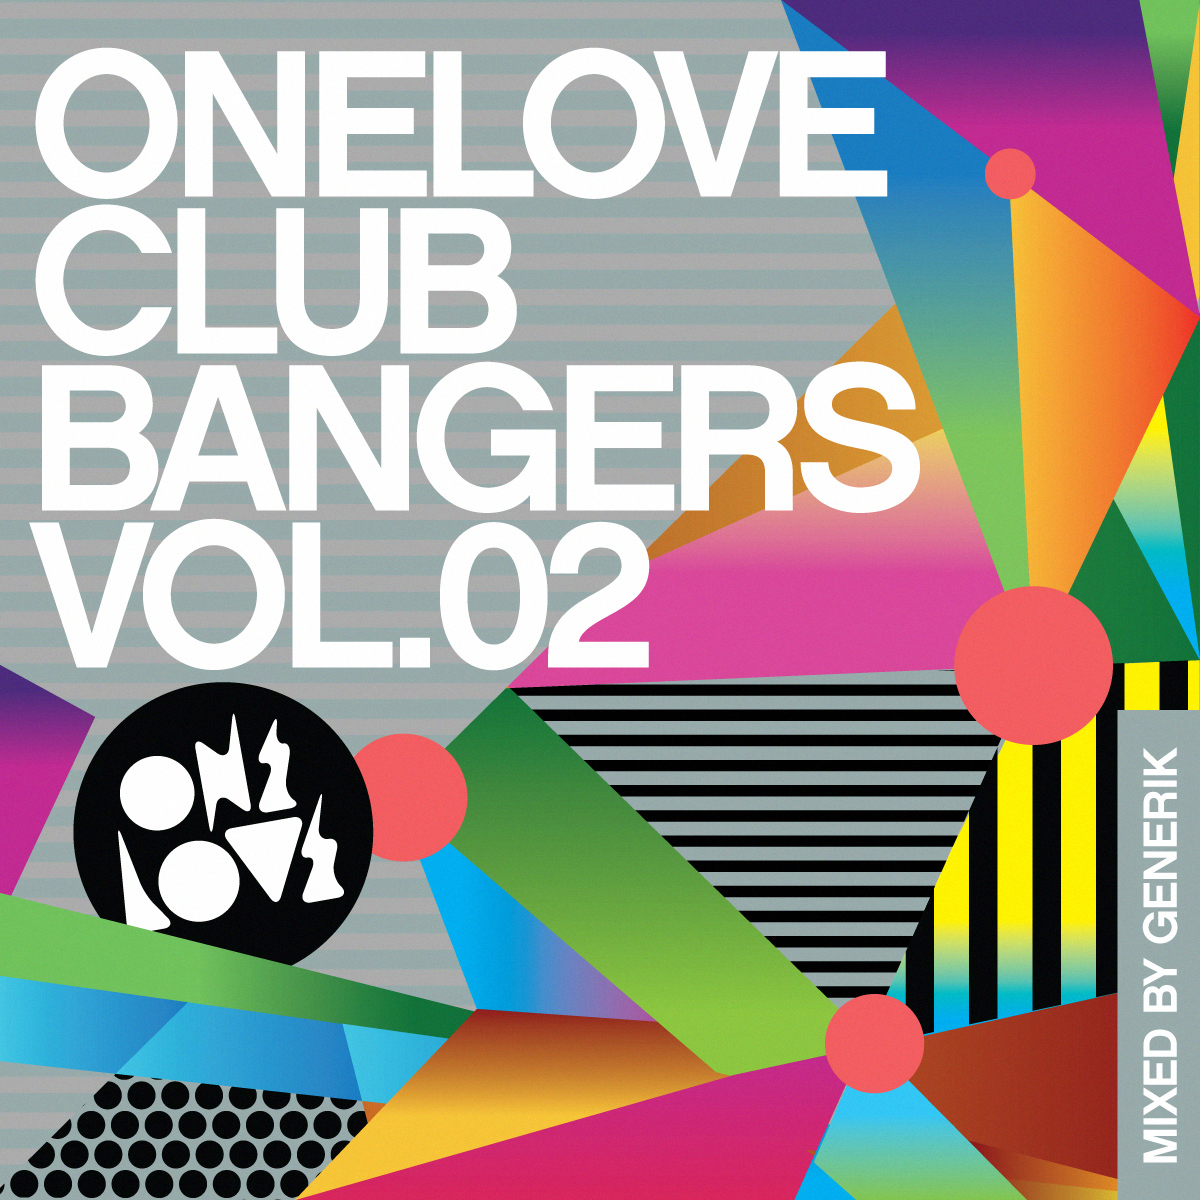 ONELOVE-Club-Bangers-Vol-2